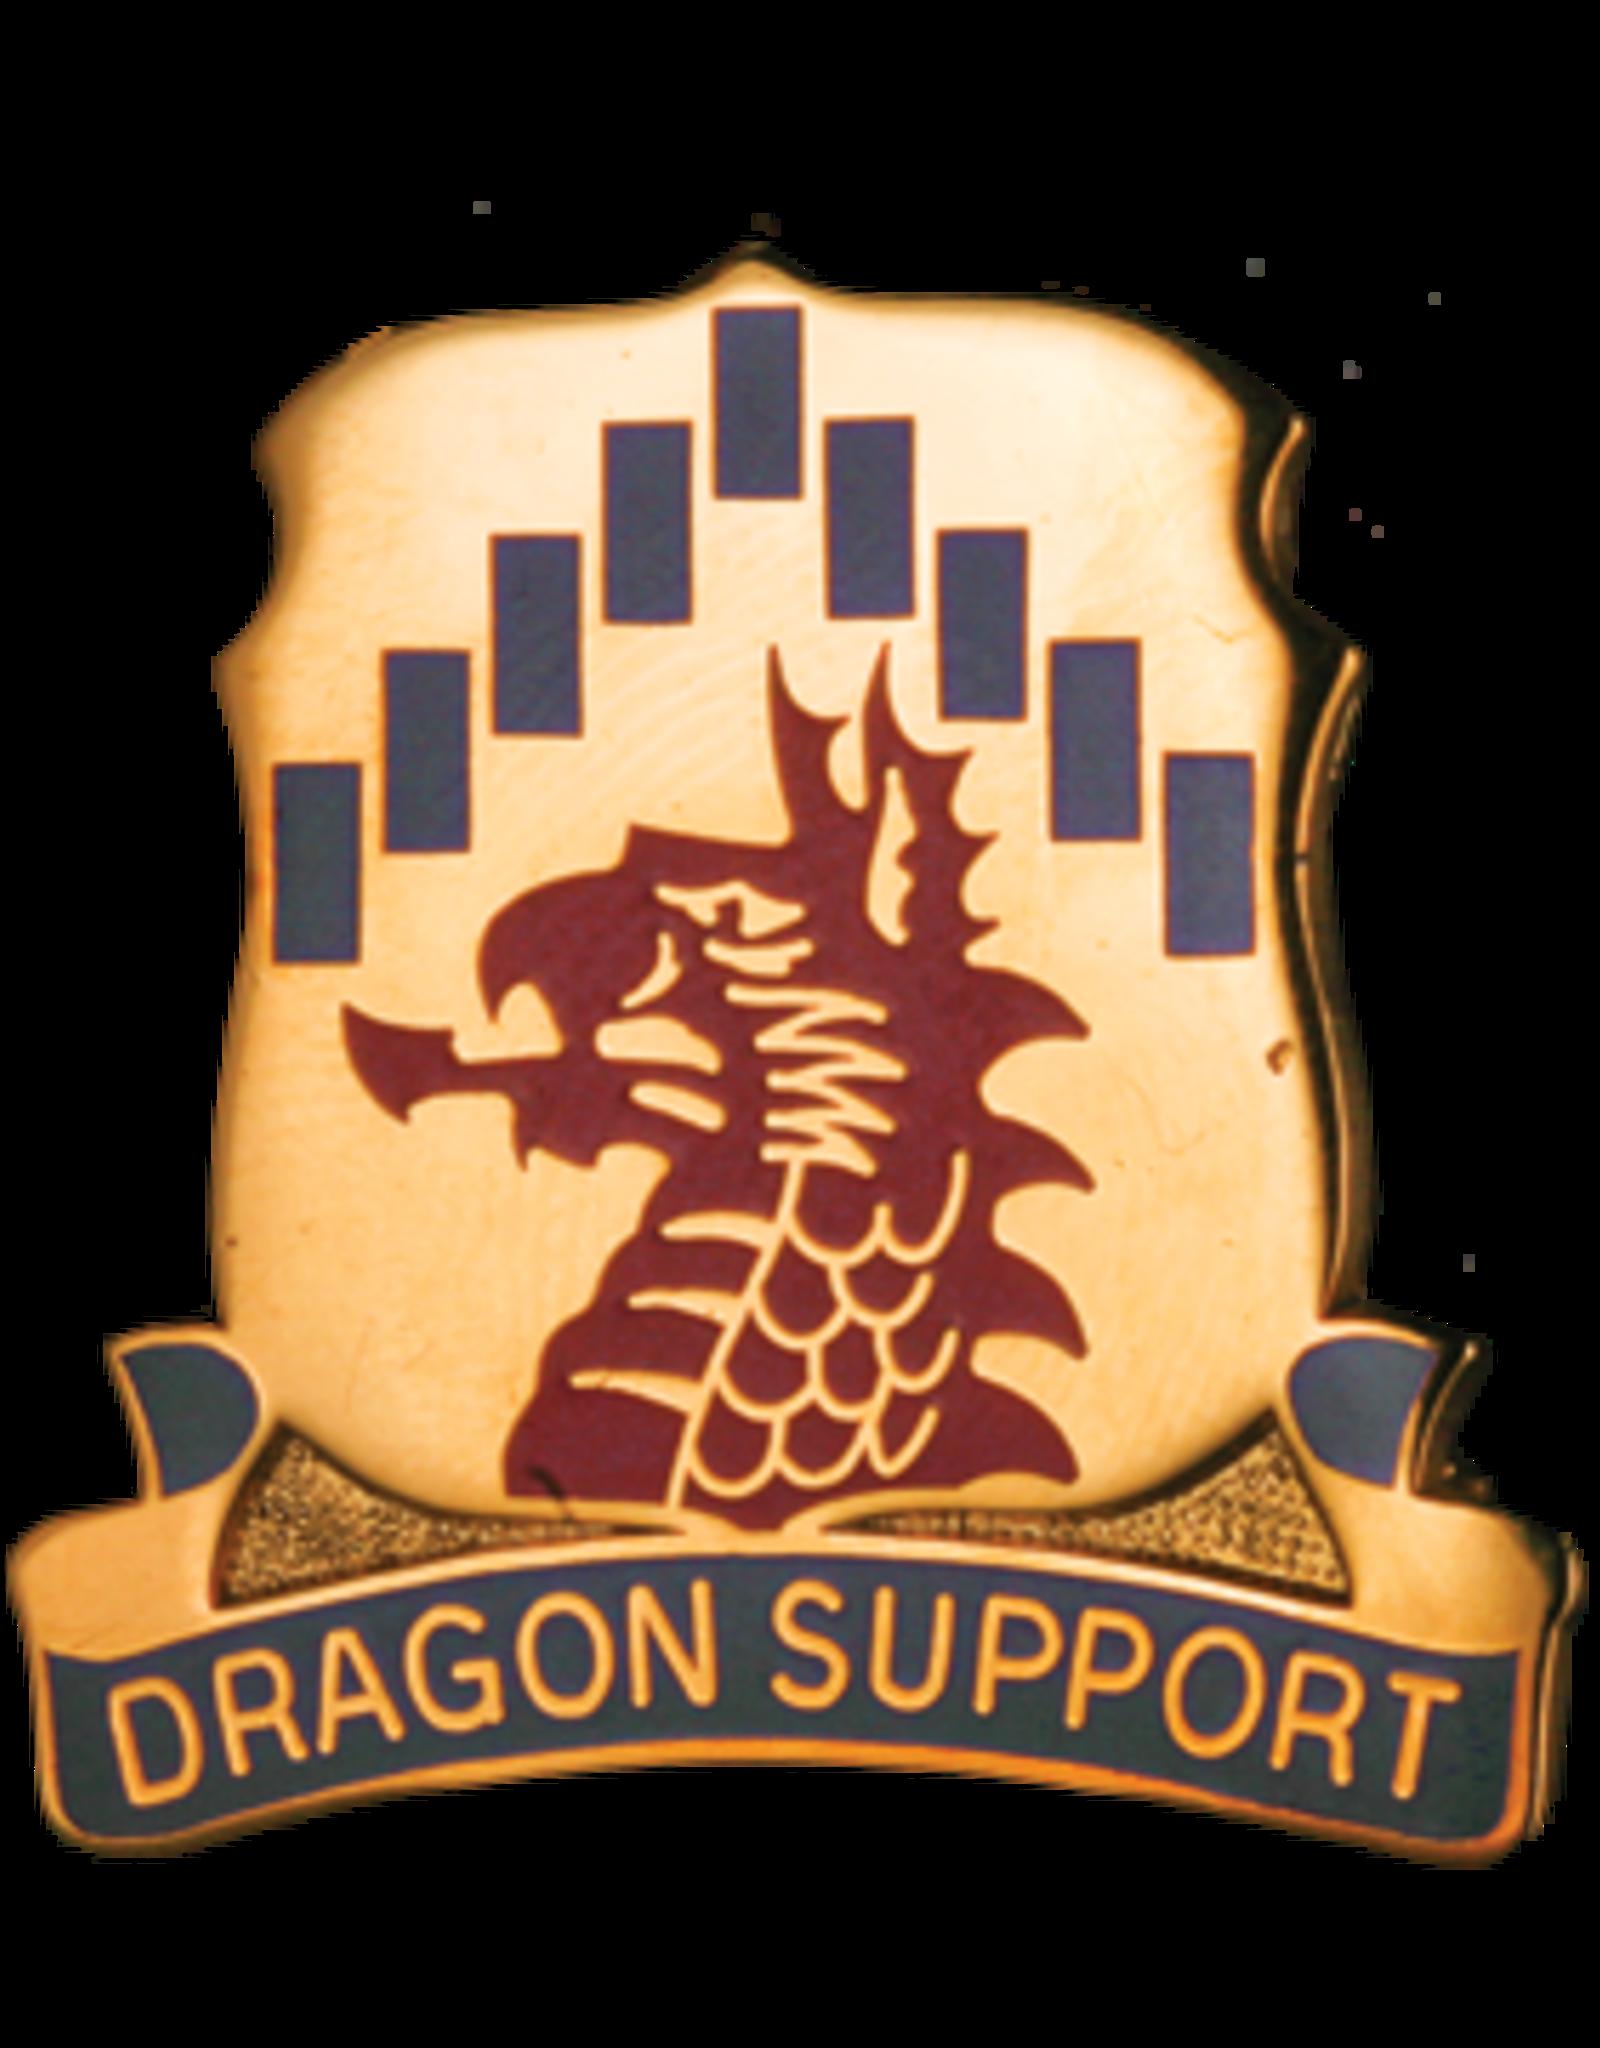 601st Support Battalion Unit Crest, Dragon Support